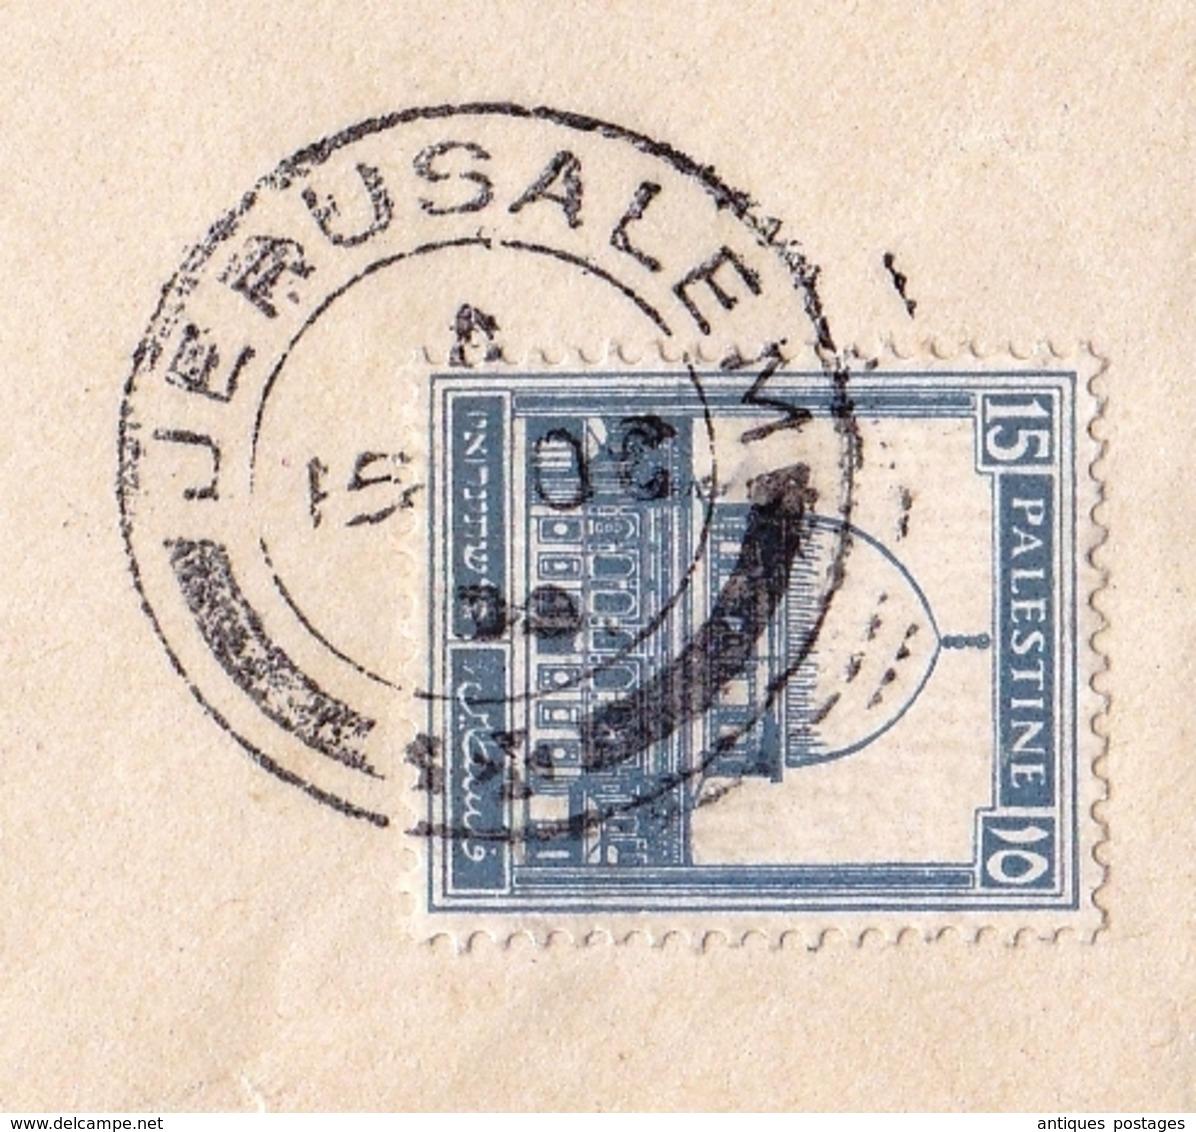 Lettre Jérusalem Palestine 1934 Israel Giornale D'Orient Alexandrie Alessandria Egypt Egypte Jerusalem - Palestine